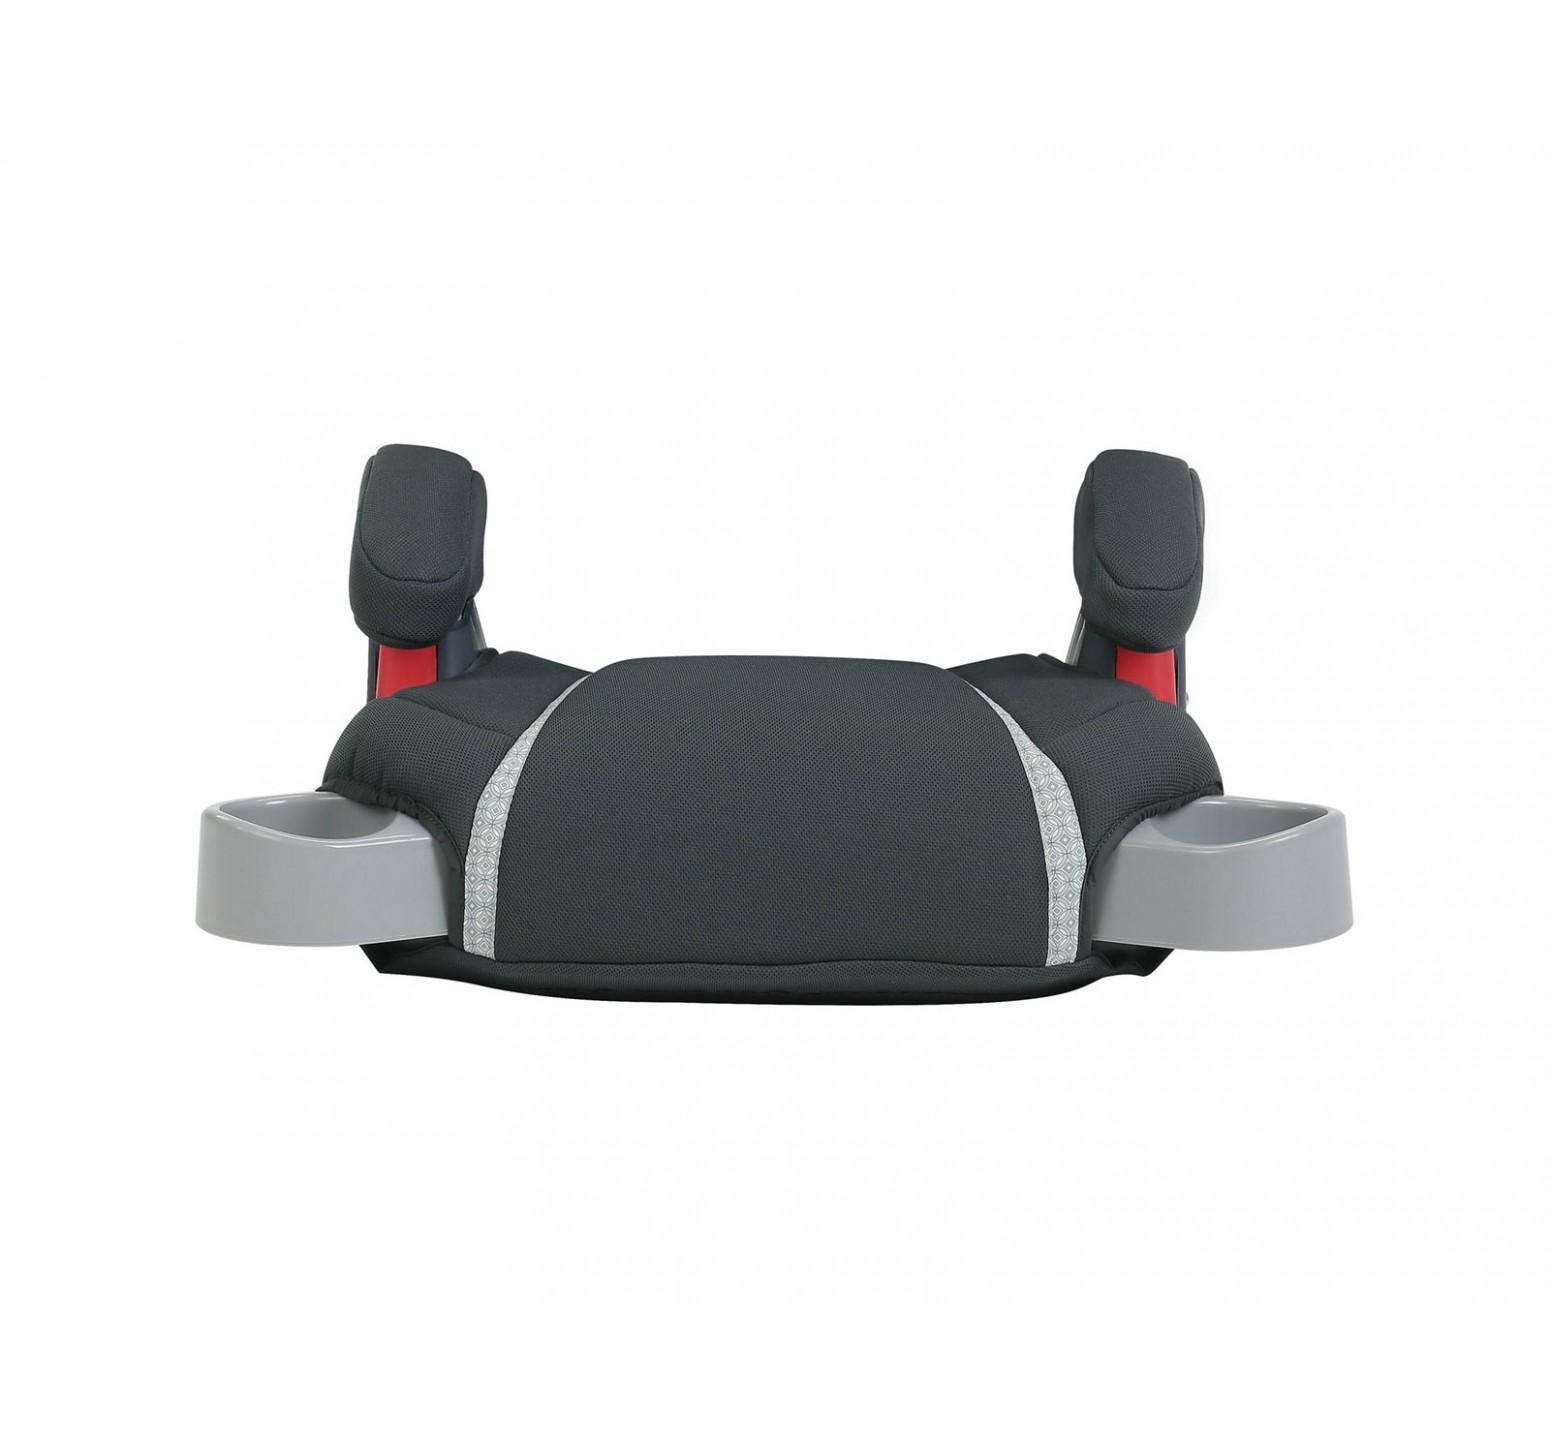 Graco Silla para auto Highback TurboBooster® Glacier